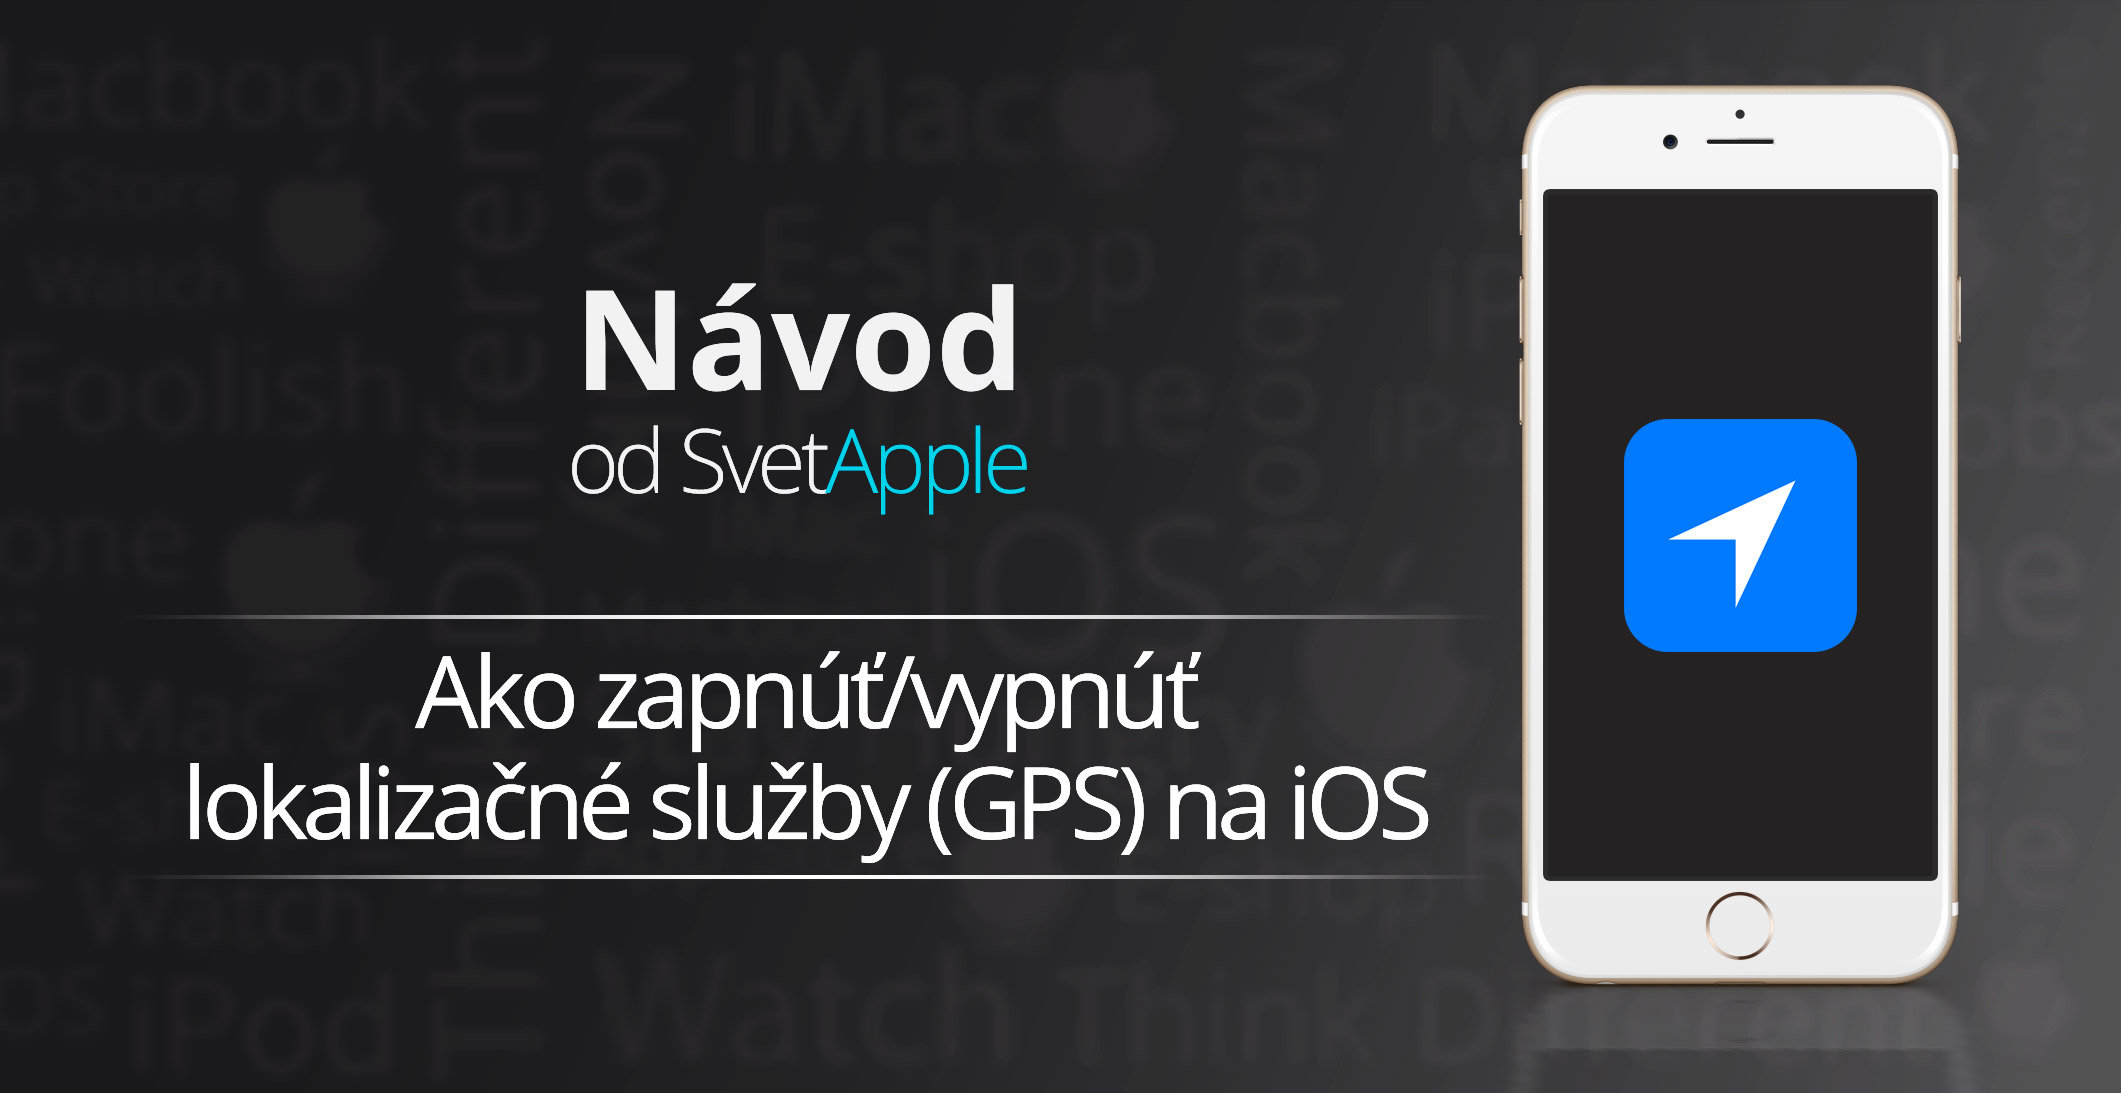 navod-lokalizacne-sluzby-iphone-svetapple